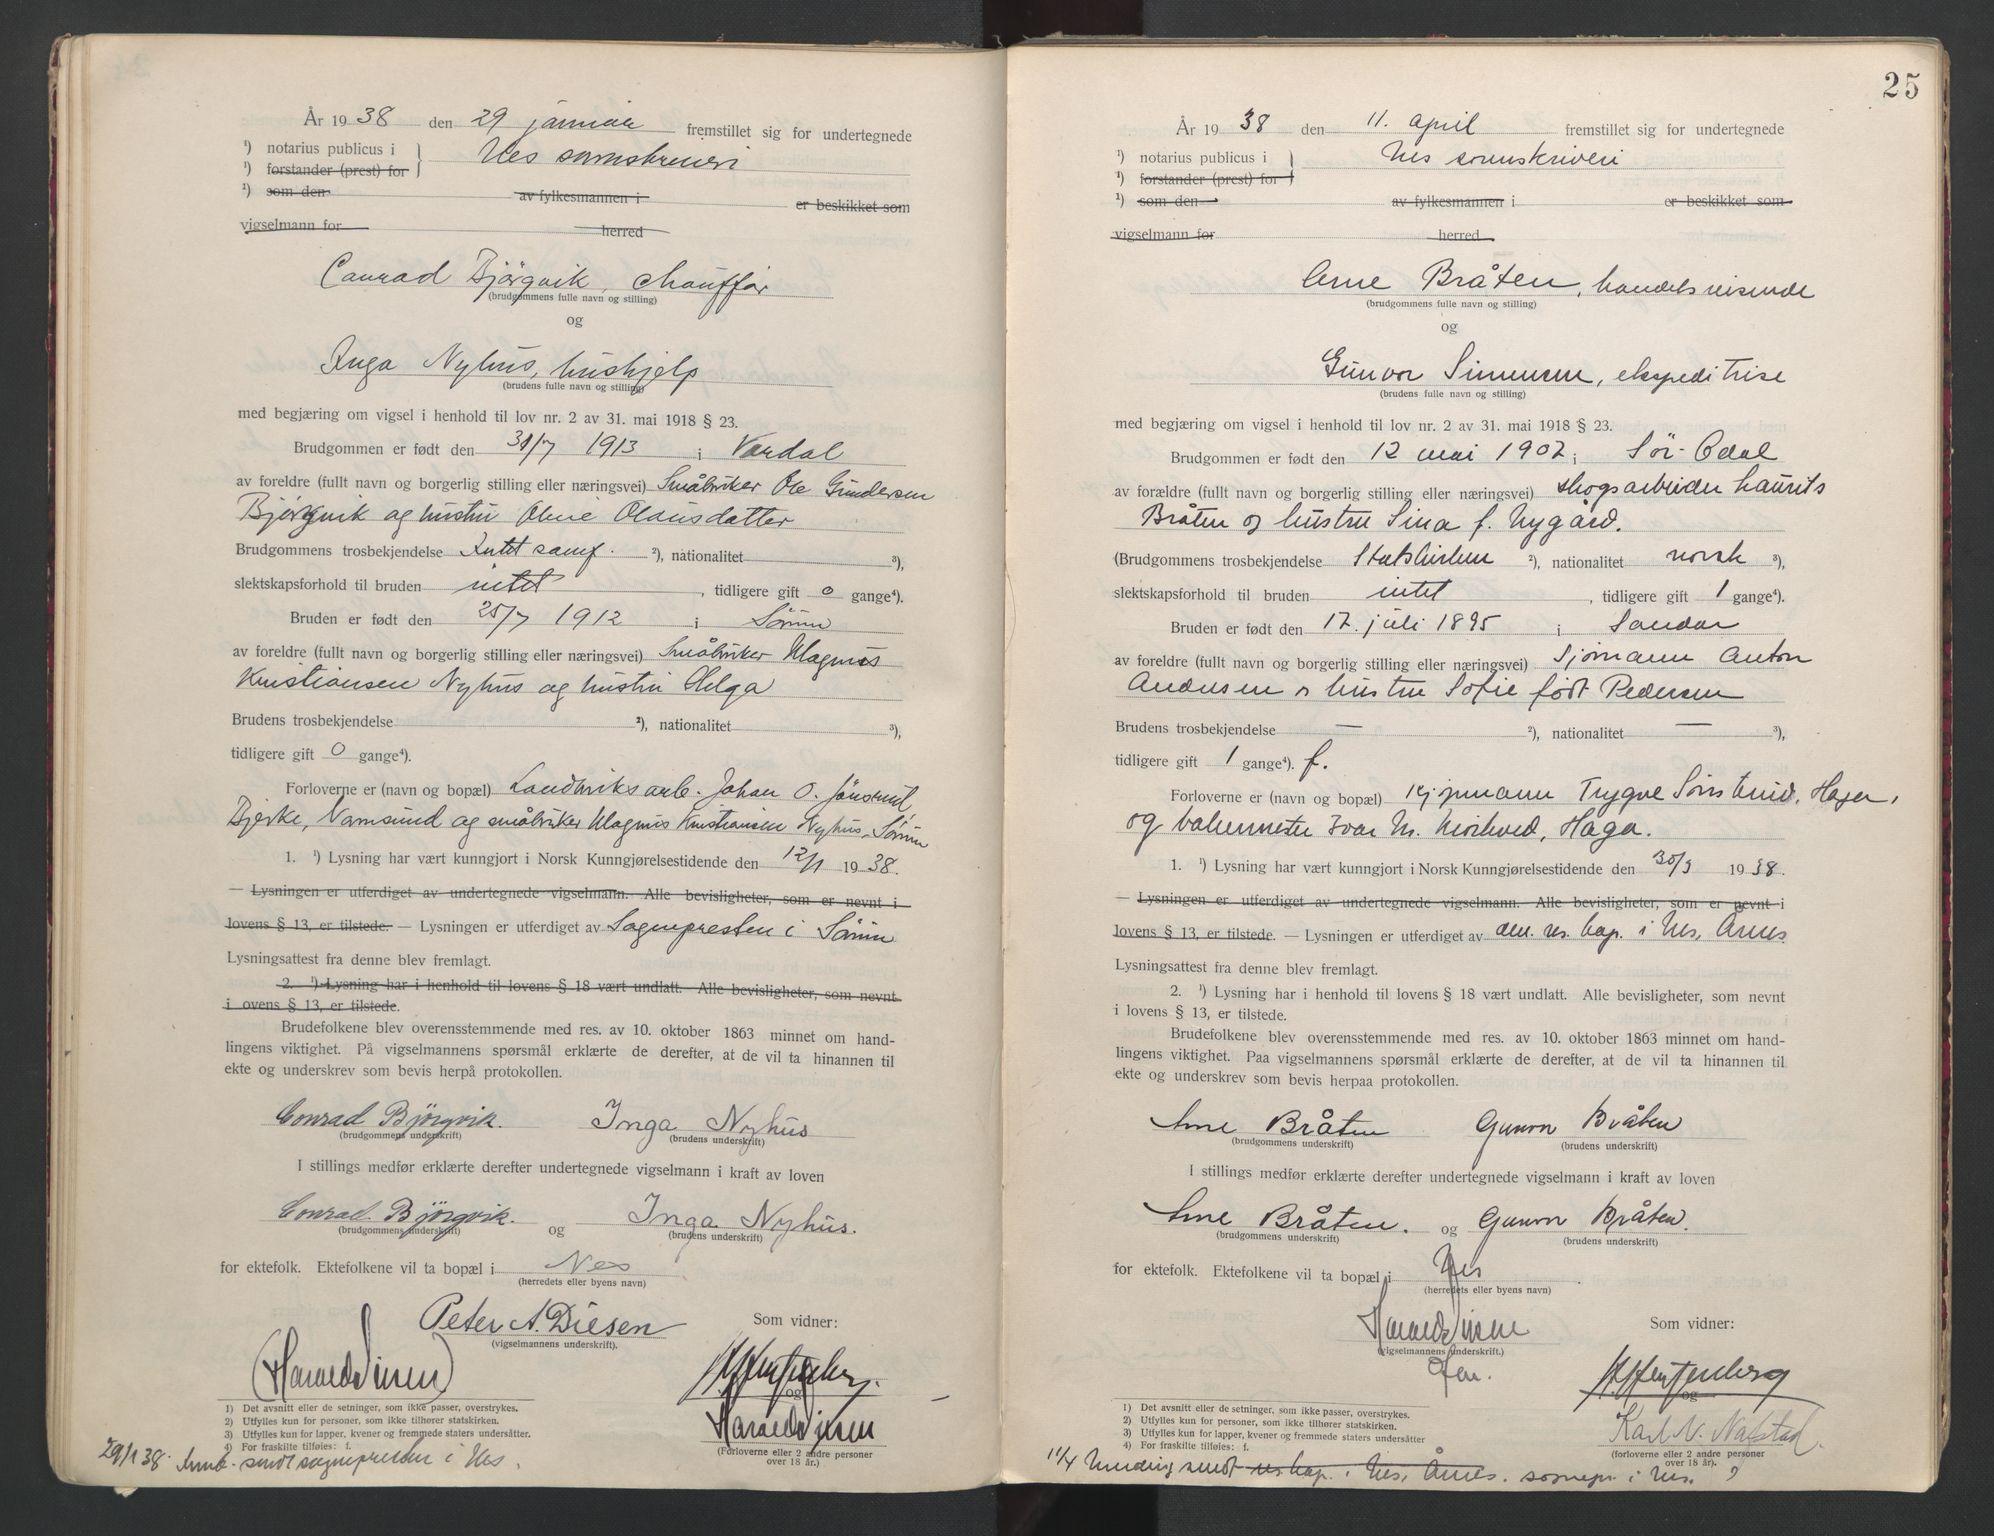 SAO, Nes tingrett, L/Lc/Lca/L0001: Vigselbok, 1920-1943, s. 25